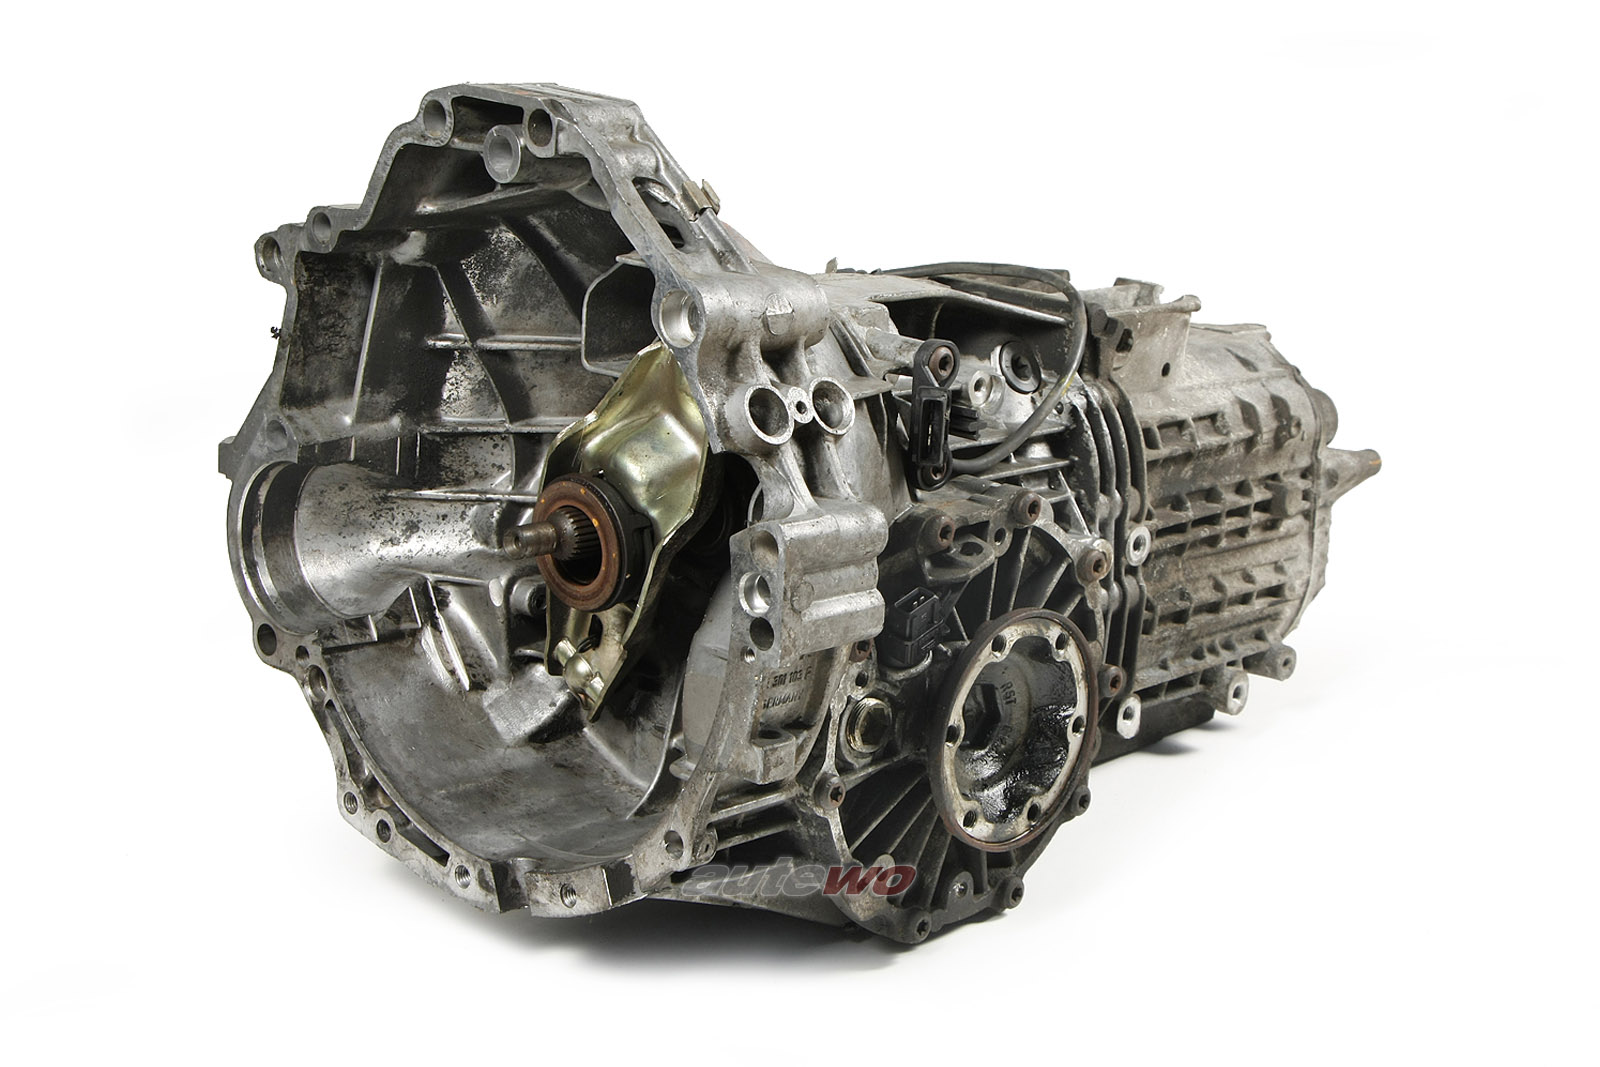 012300053CX Audi/VW 80 Typ 89 Cabrio/A4 B5/A6 C4 1.8l Getriebe DHZ 18077